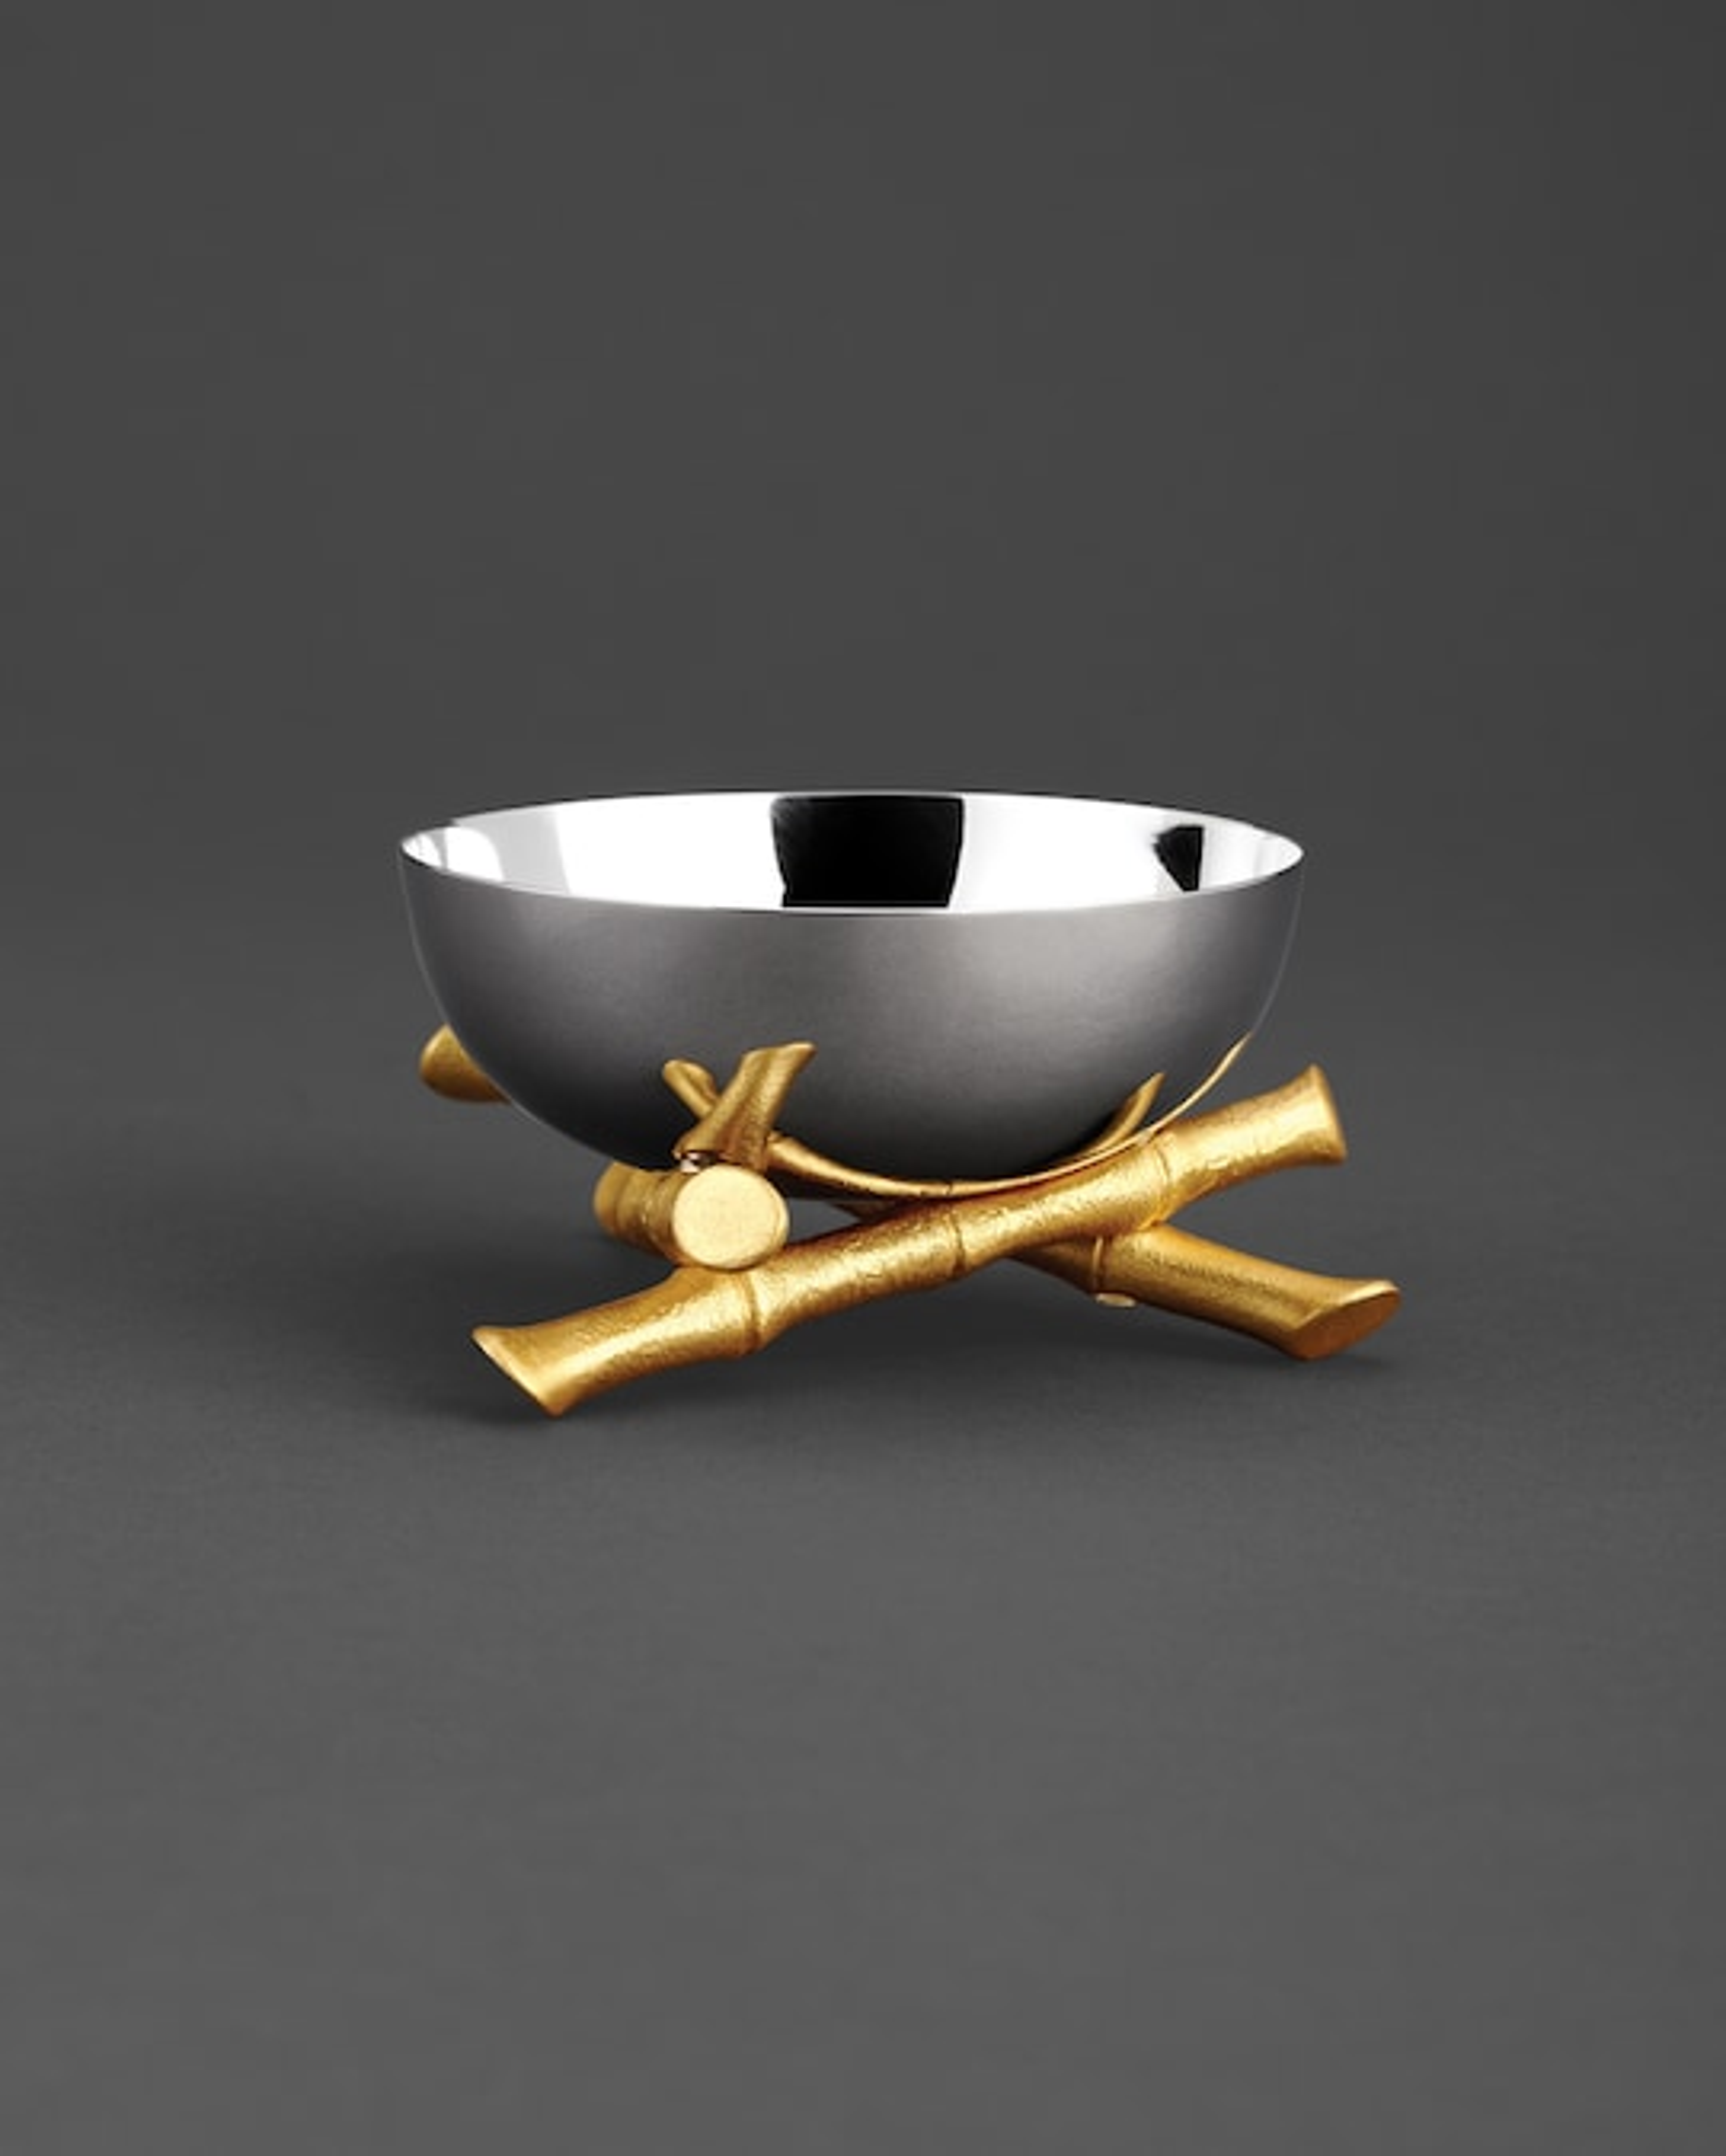 L'Objet Bambou Small Bowl 1